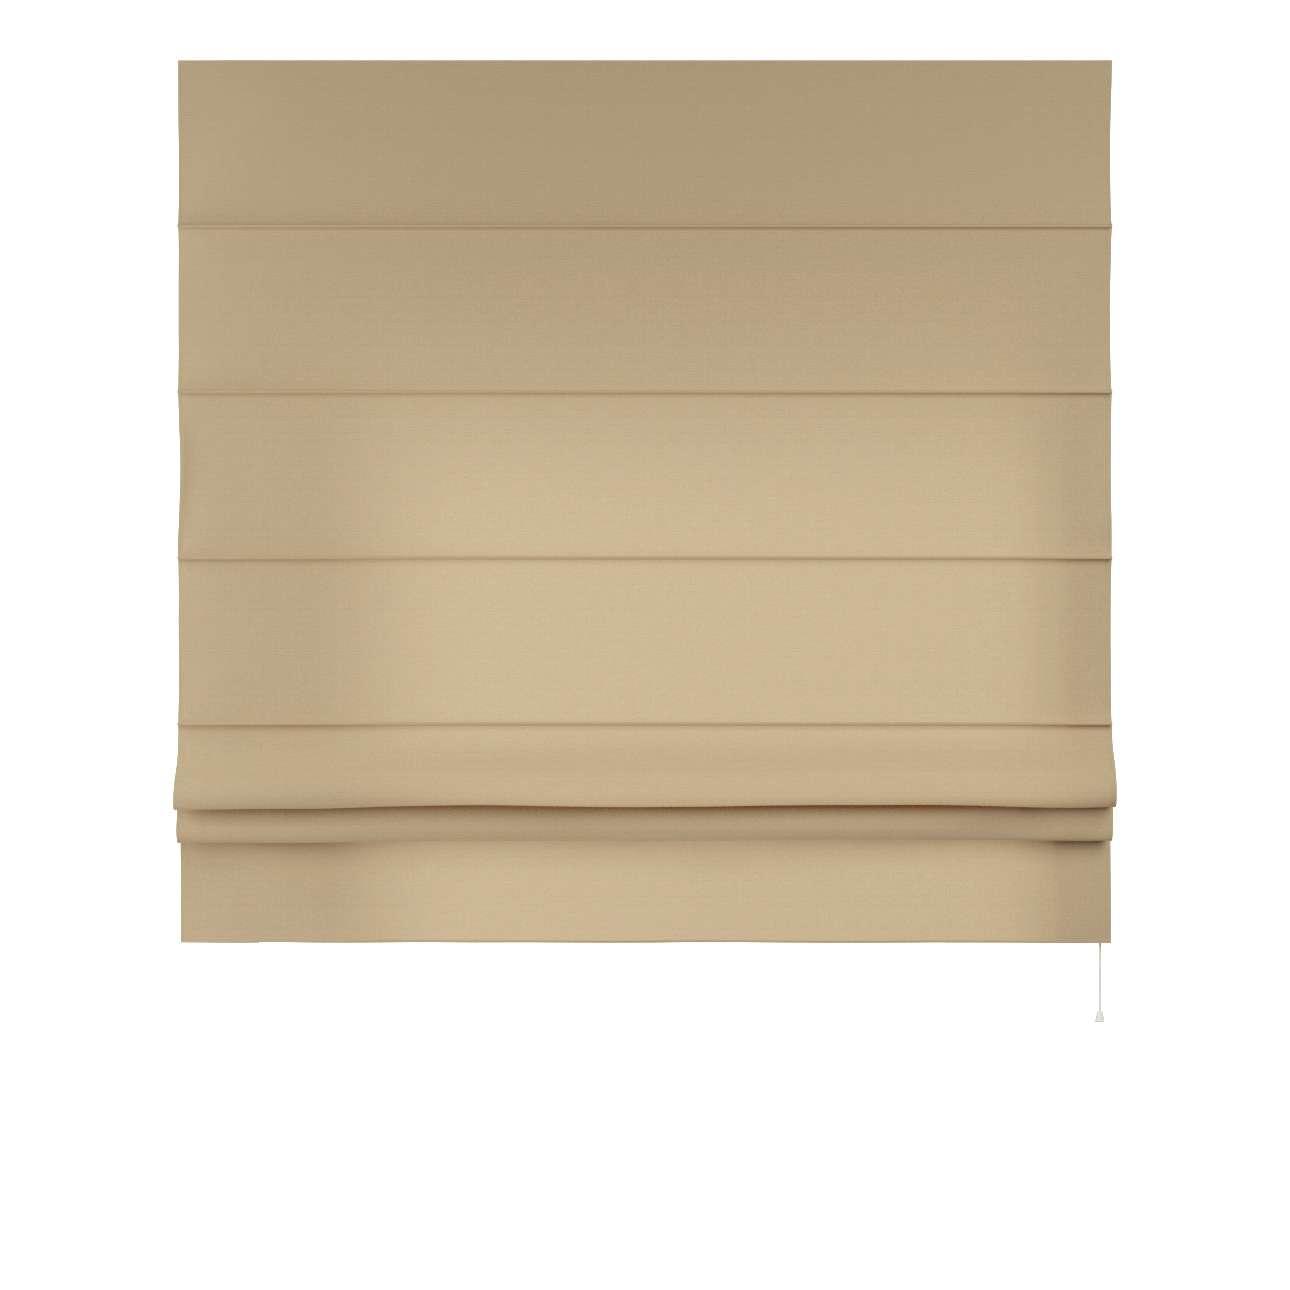 Raffrollo Padva 80 x 170 cm von der Kollektion Cotton Panama, Stoff: 702-01